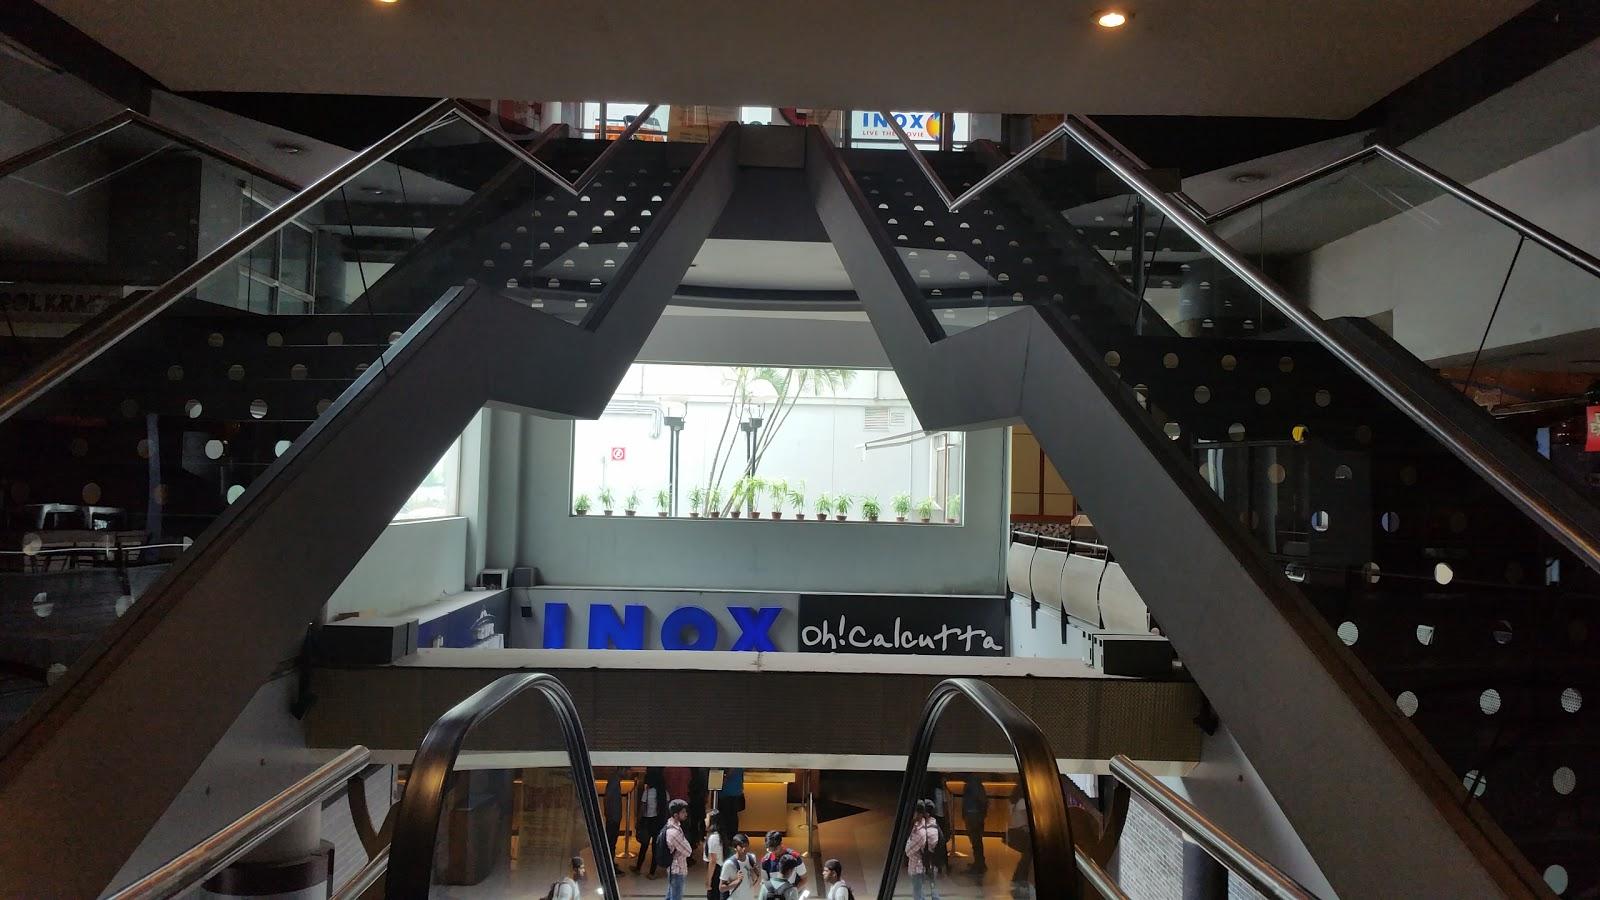 INOX (Forum Mall)